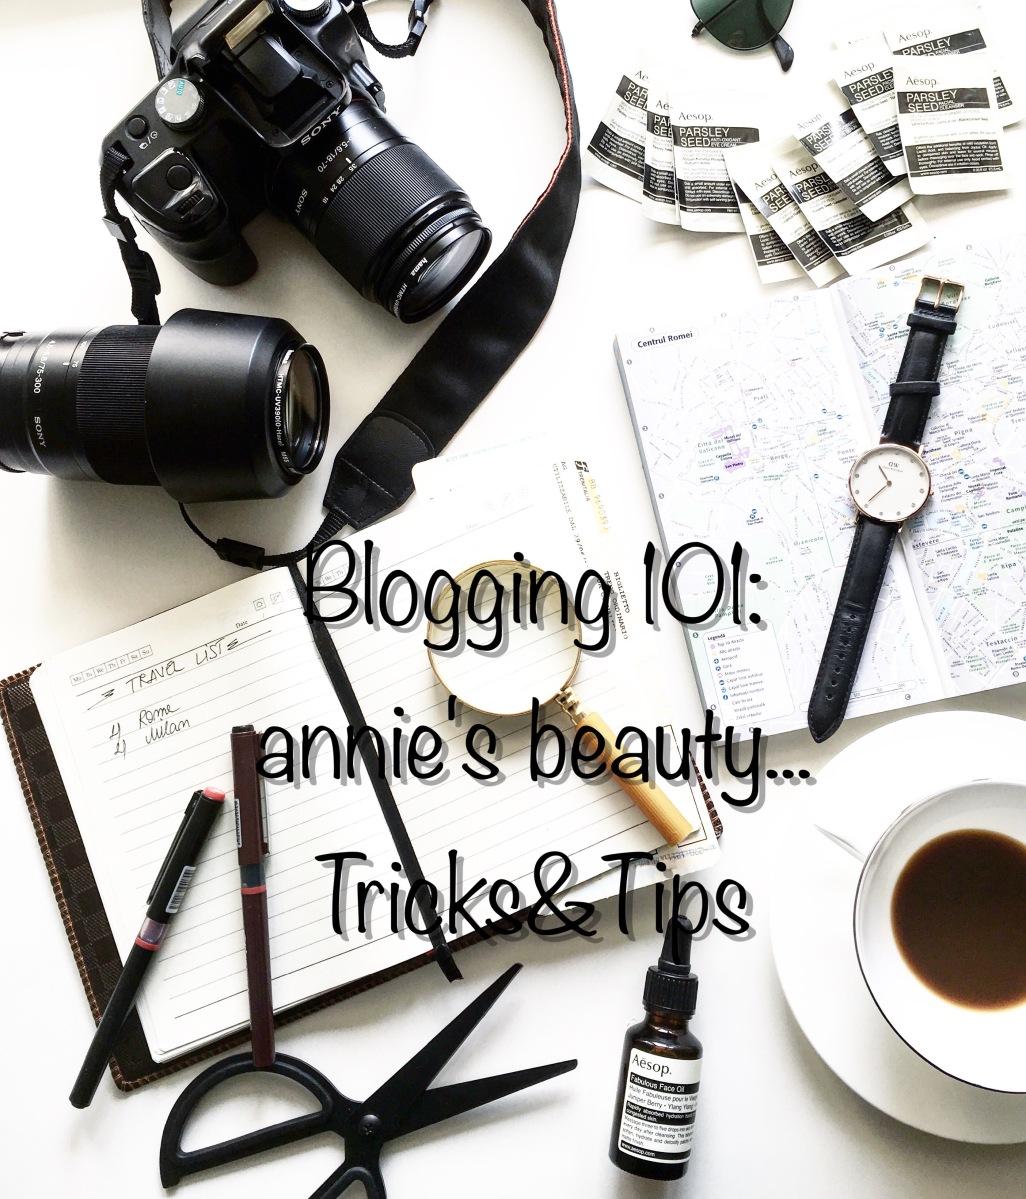 Blogging 101 - annie's beauty... Tricks & Tips